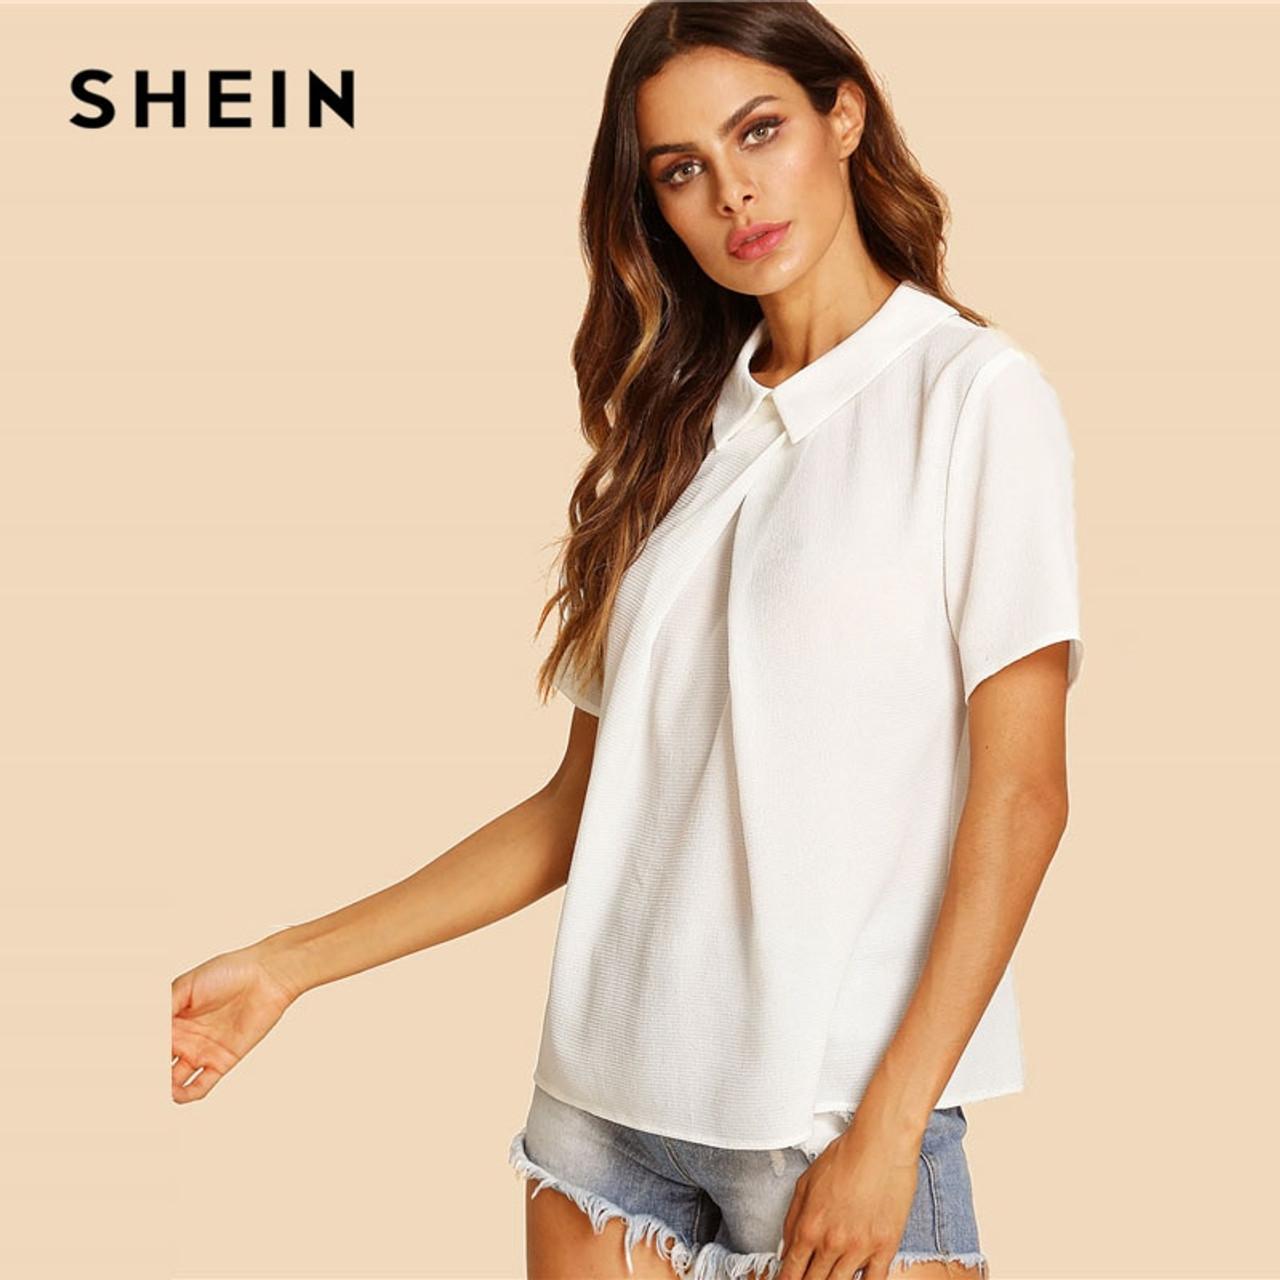 7faa9e9edb ... SHEIN White Overlap Fold Plain Top Women Peter Pan Collar Short Sleeve  Button Soild Blouse 2018 ...